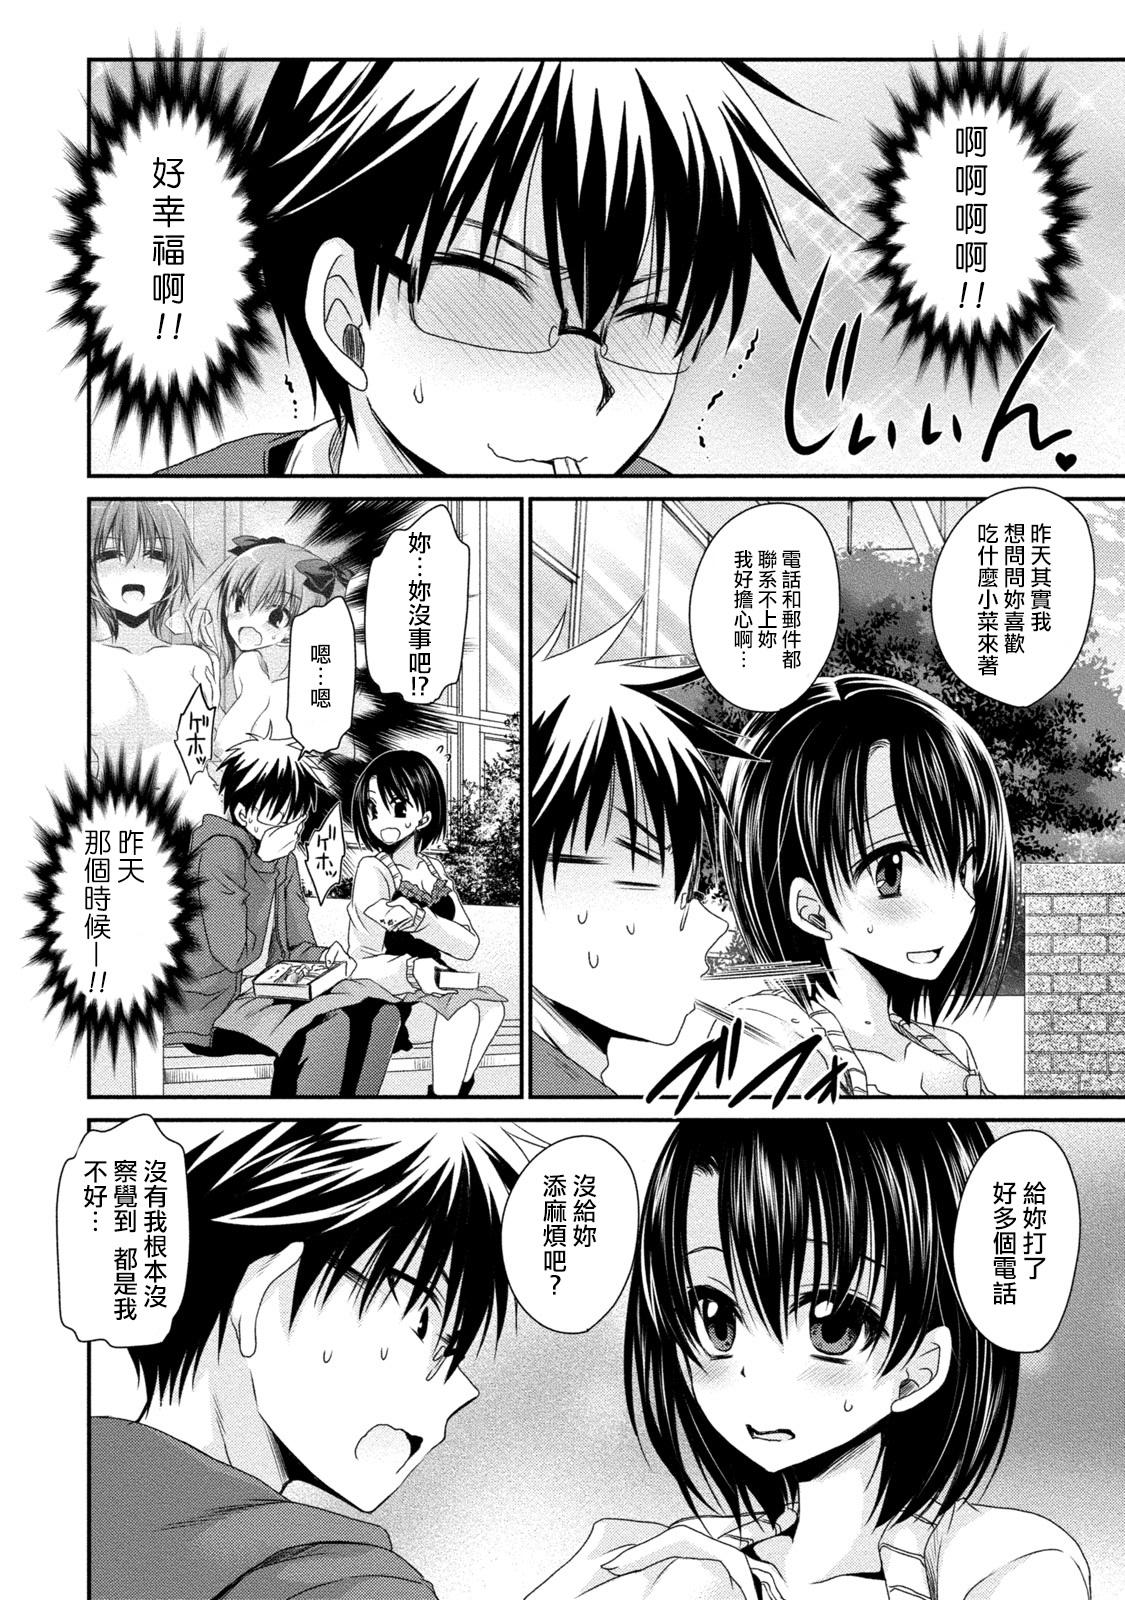 [Shinonome Ryu] Ore to Kanojo to Owaru Sekai - World's end LoveStory ch.10-13 [Chinese] [爱弹幕汉化组] [Digital] 51